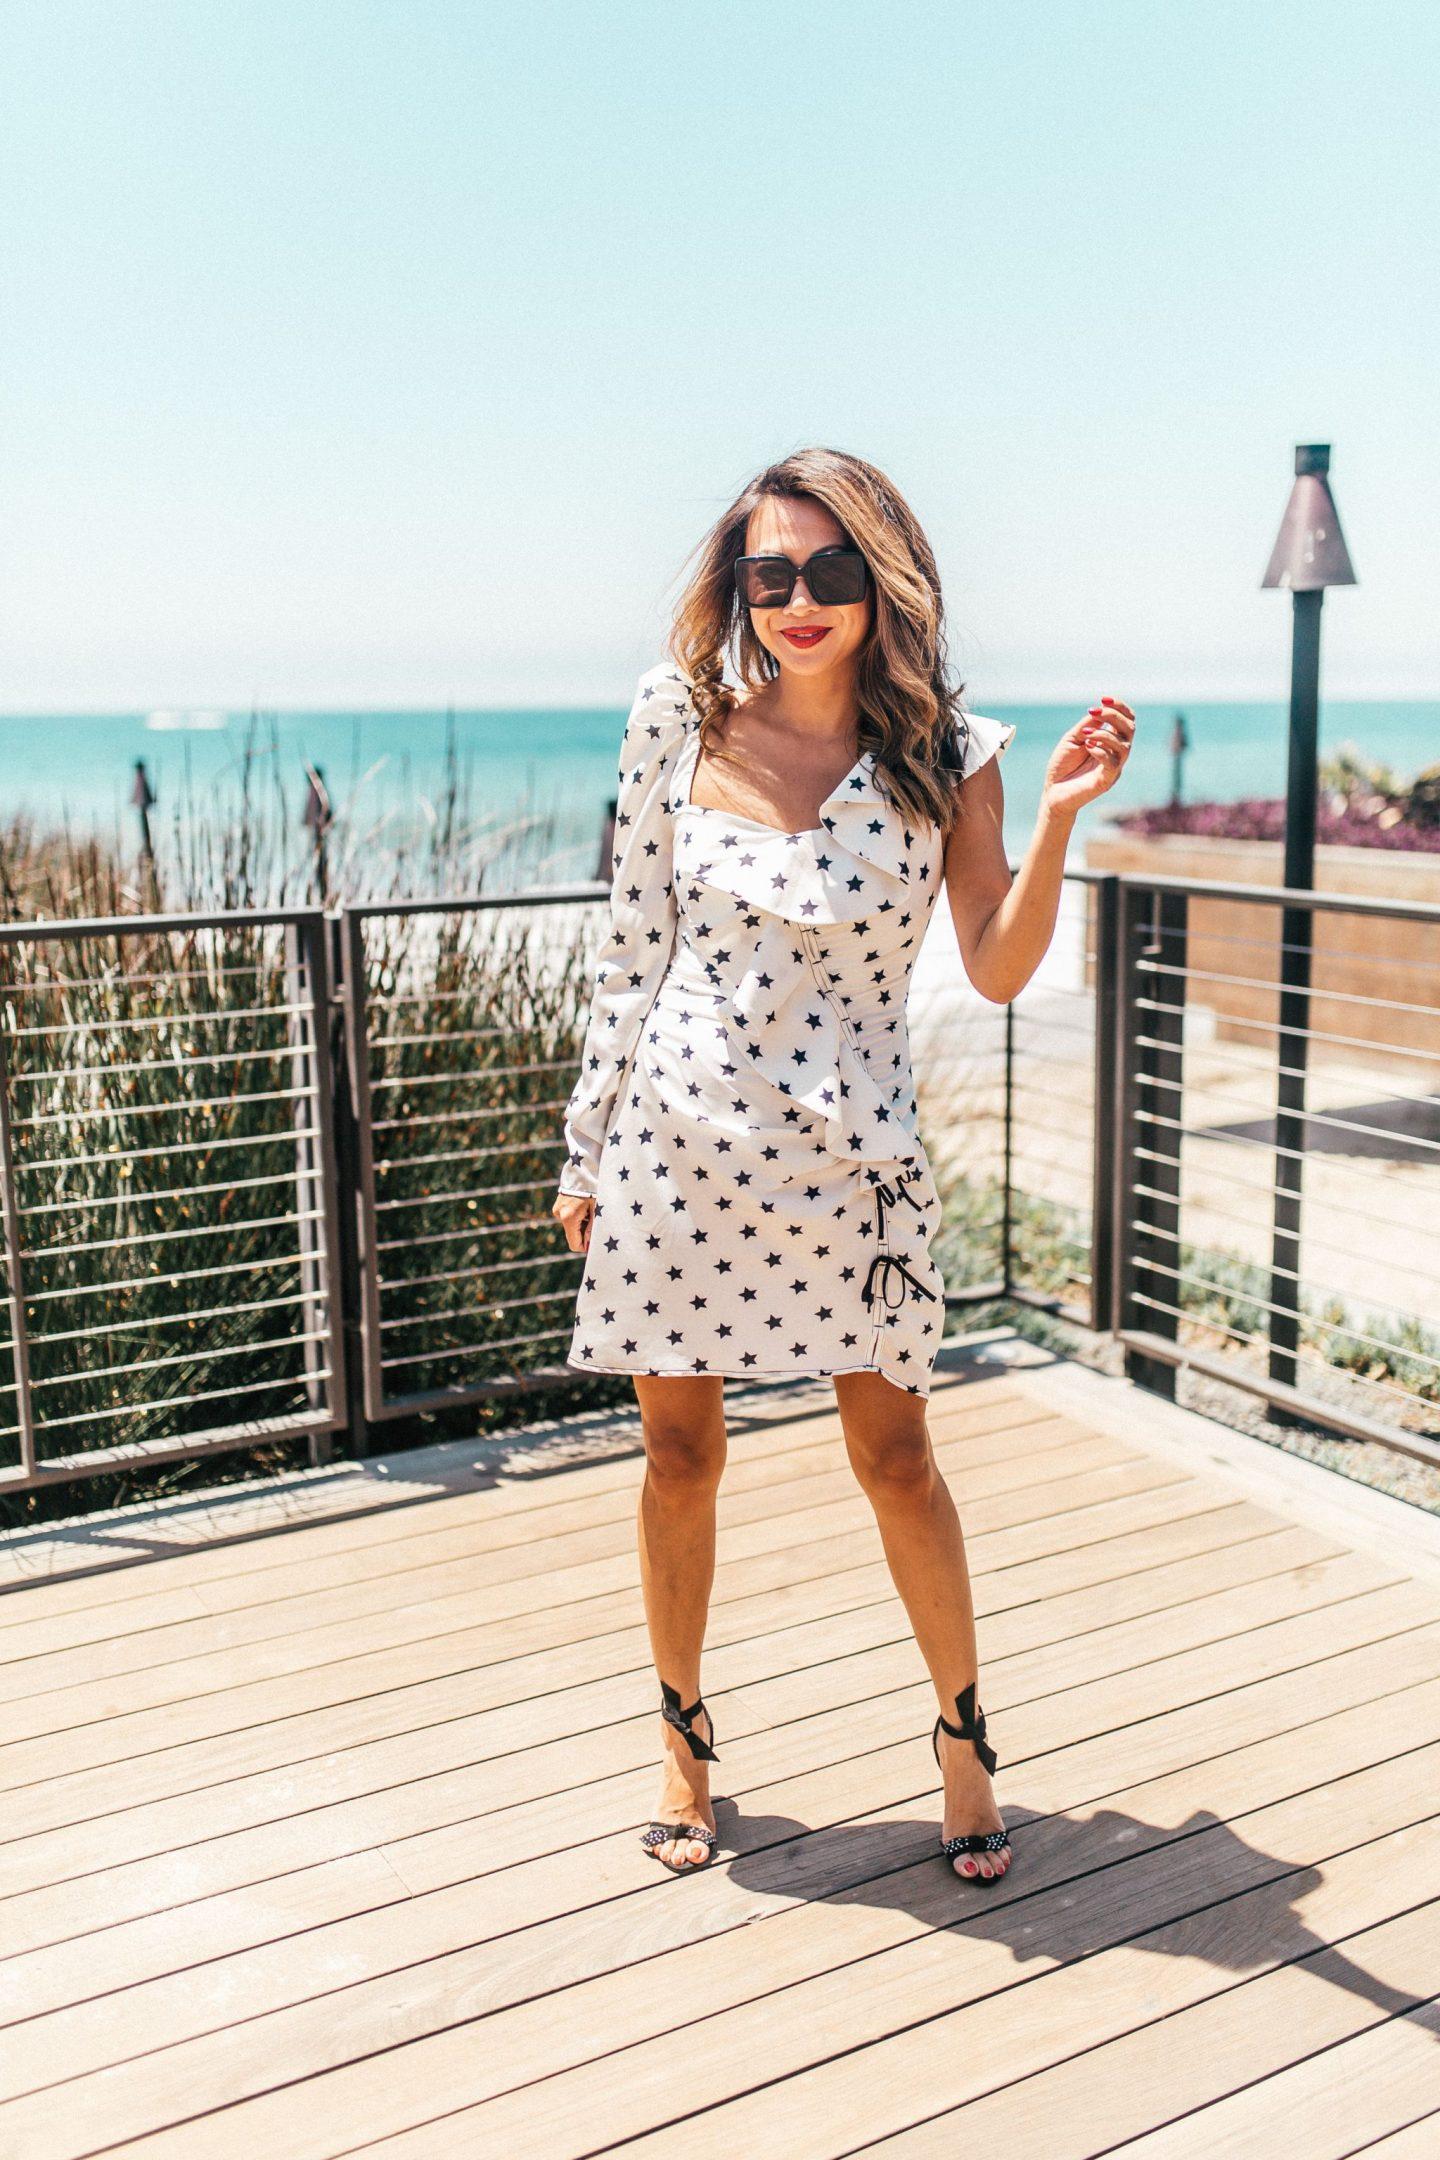 Chicago Travel Blogger, Chicago Best Fashion Blogger, Jennifer Worman, Los Angeles, LA girls trip, Nobu Malibu, star print dress, discover LA